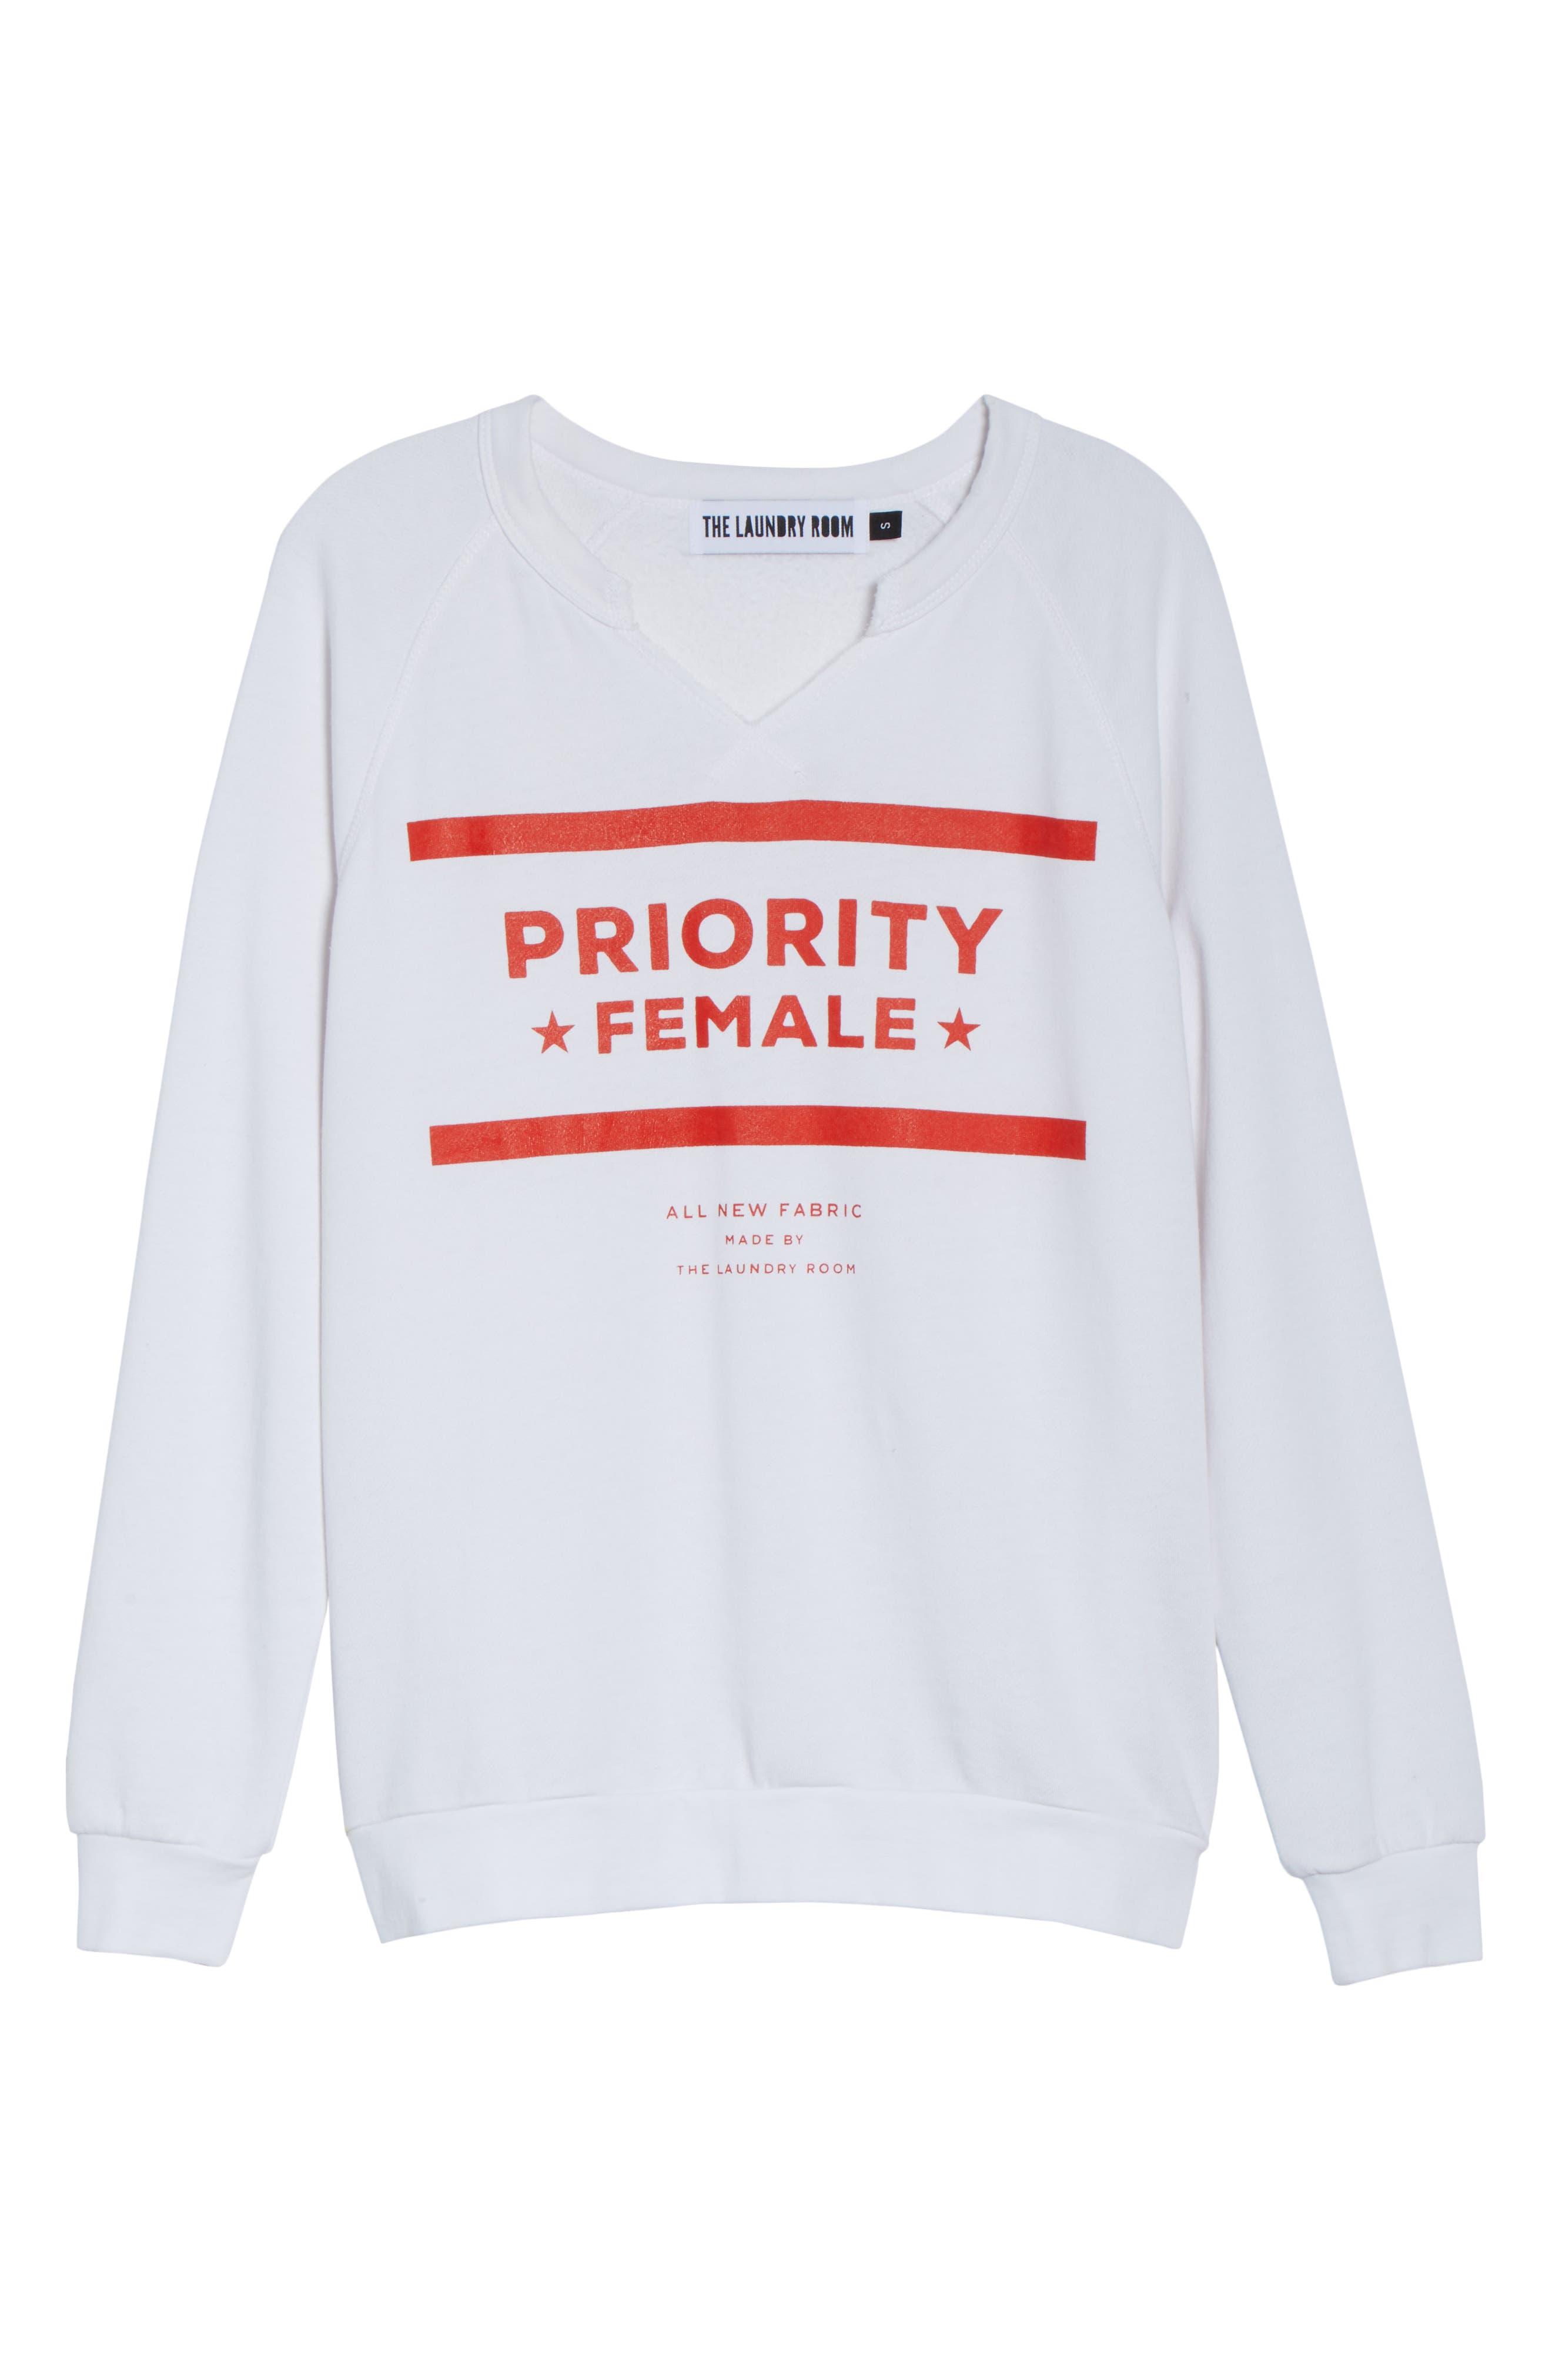 Priority Female Sweatshirt,                             Alternate thumbnail 6, color,                             WHITE